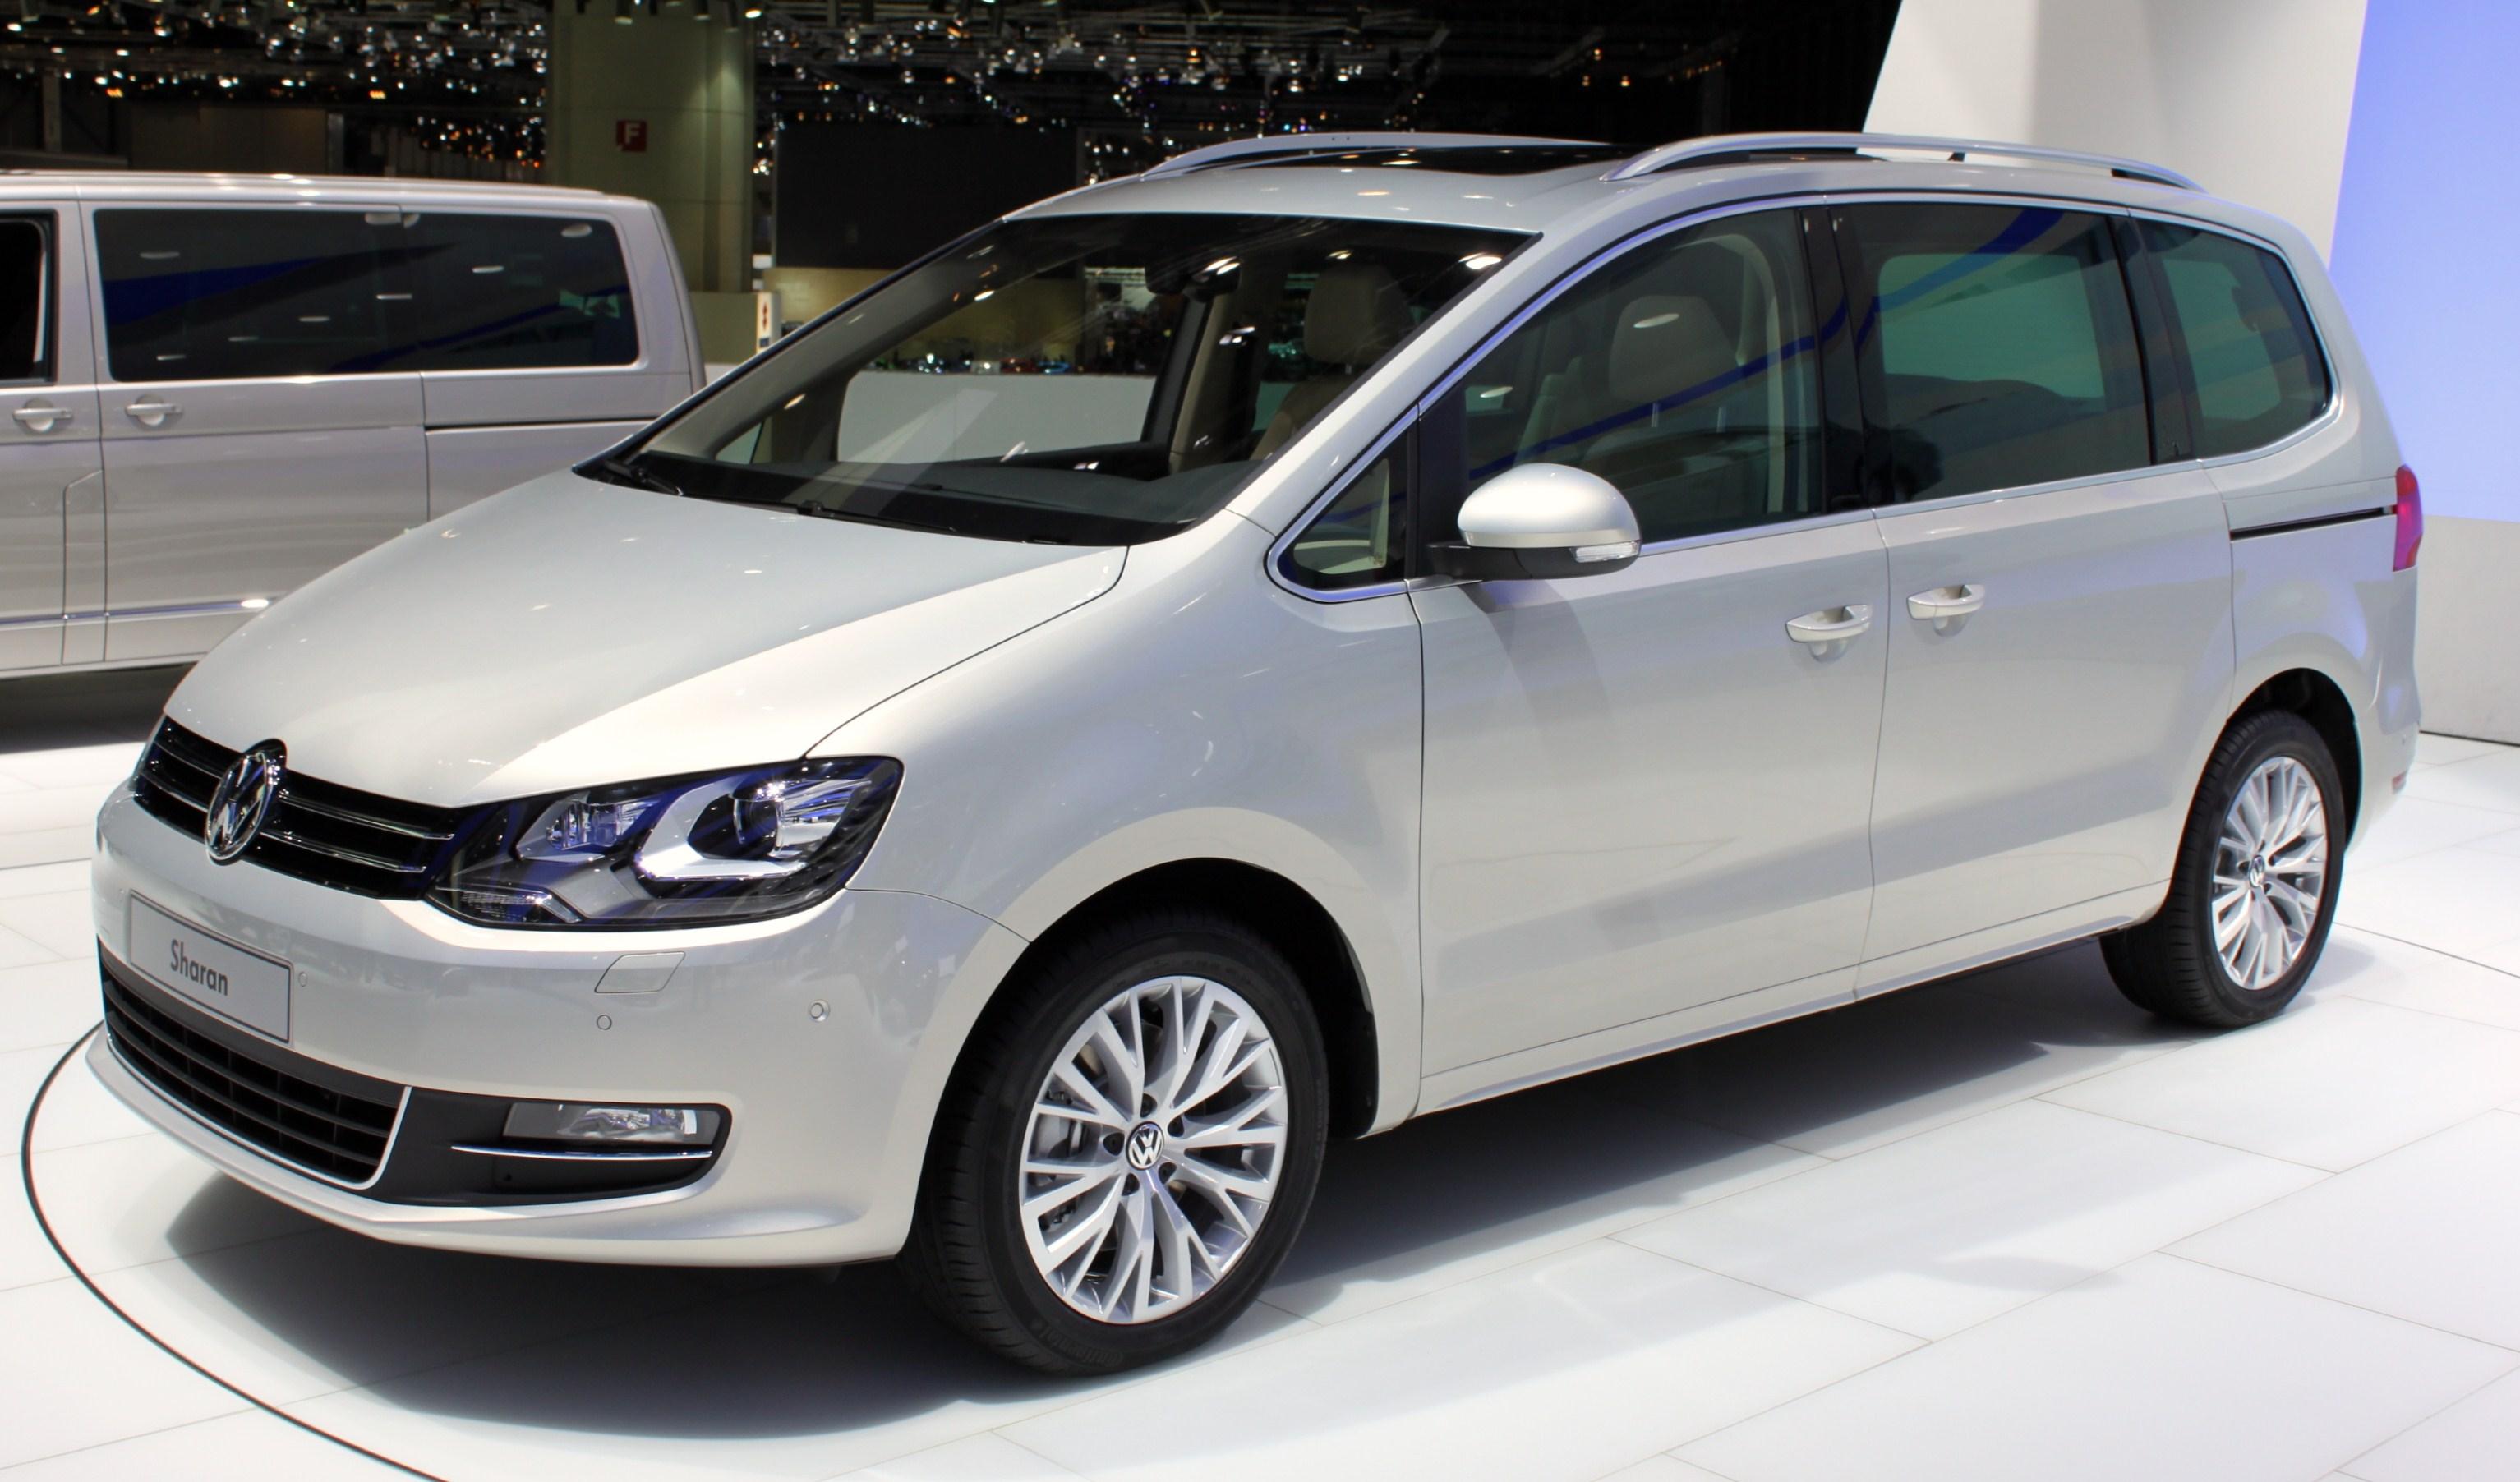 File:VW Sharan (1).JPG - Wikimedia Commons